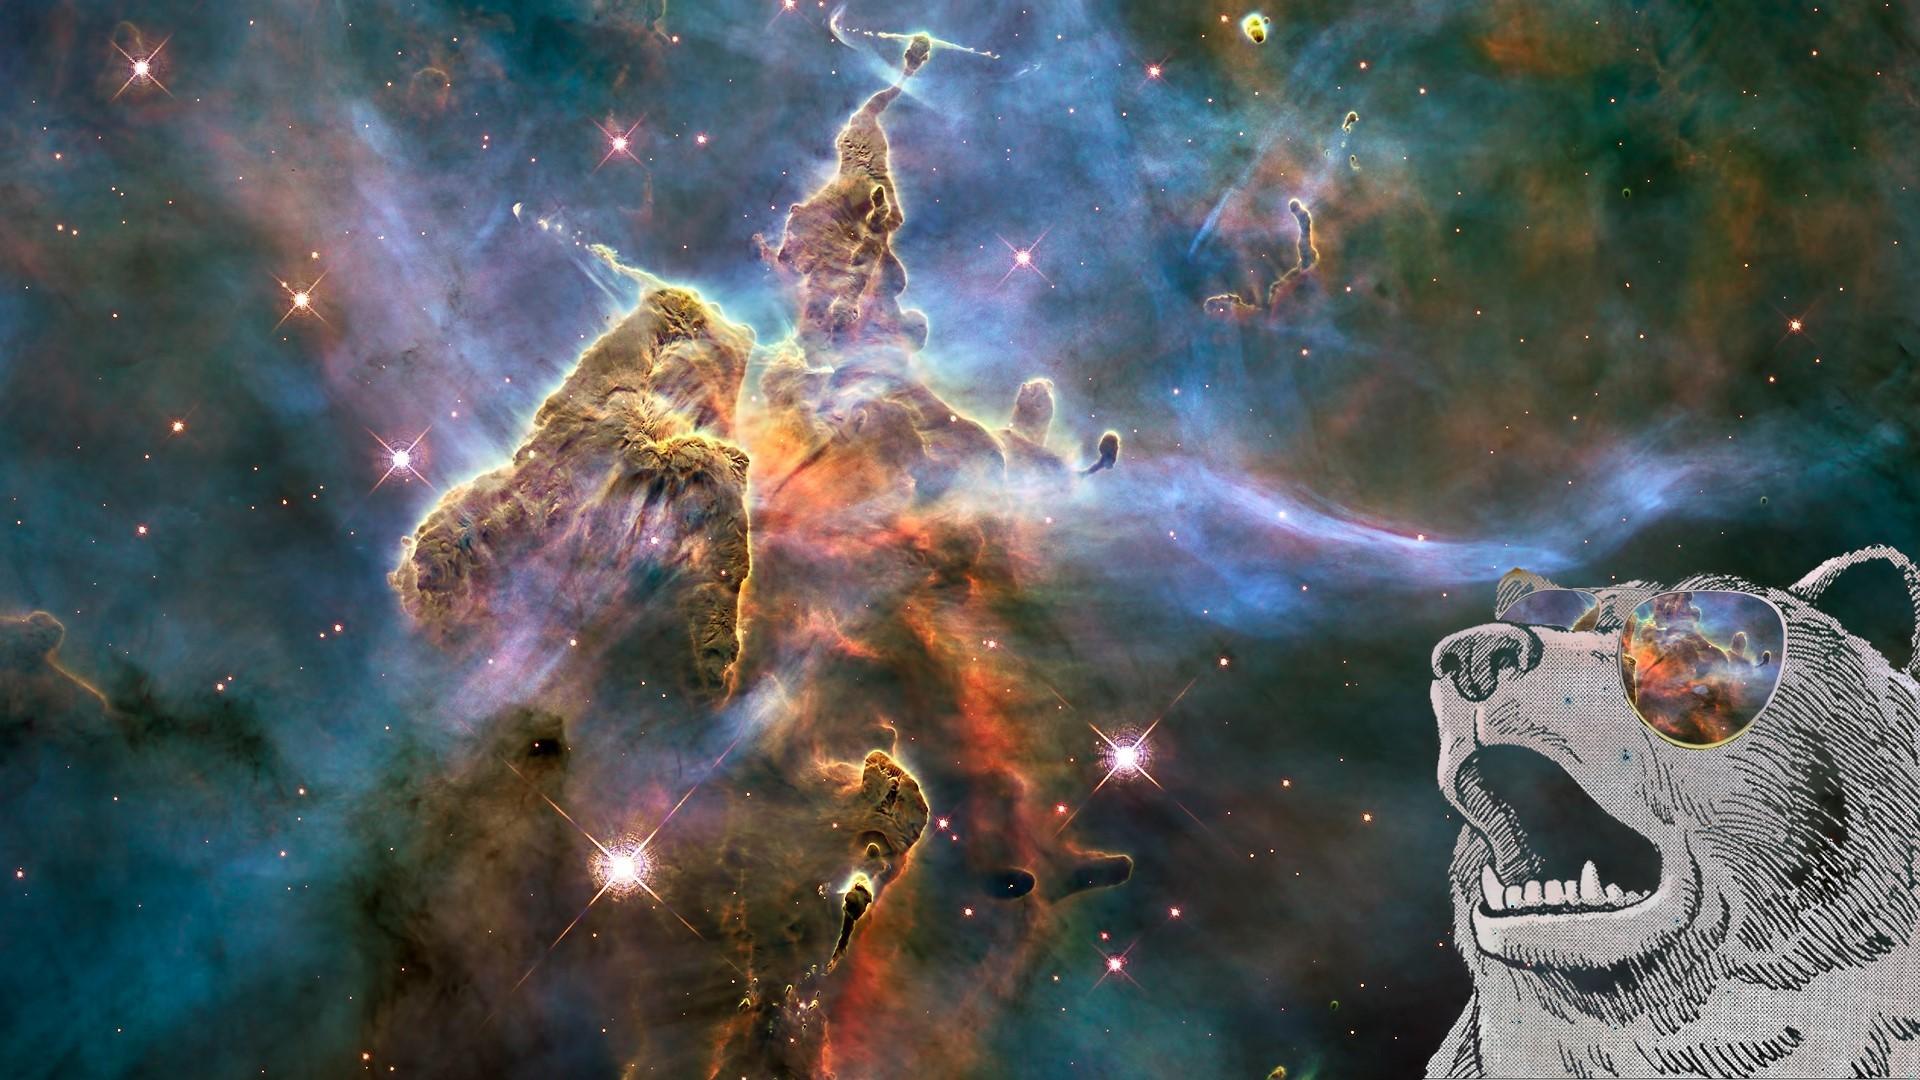 1920x1080 wallpaper imgur: Space Wallpapers Imgur